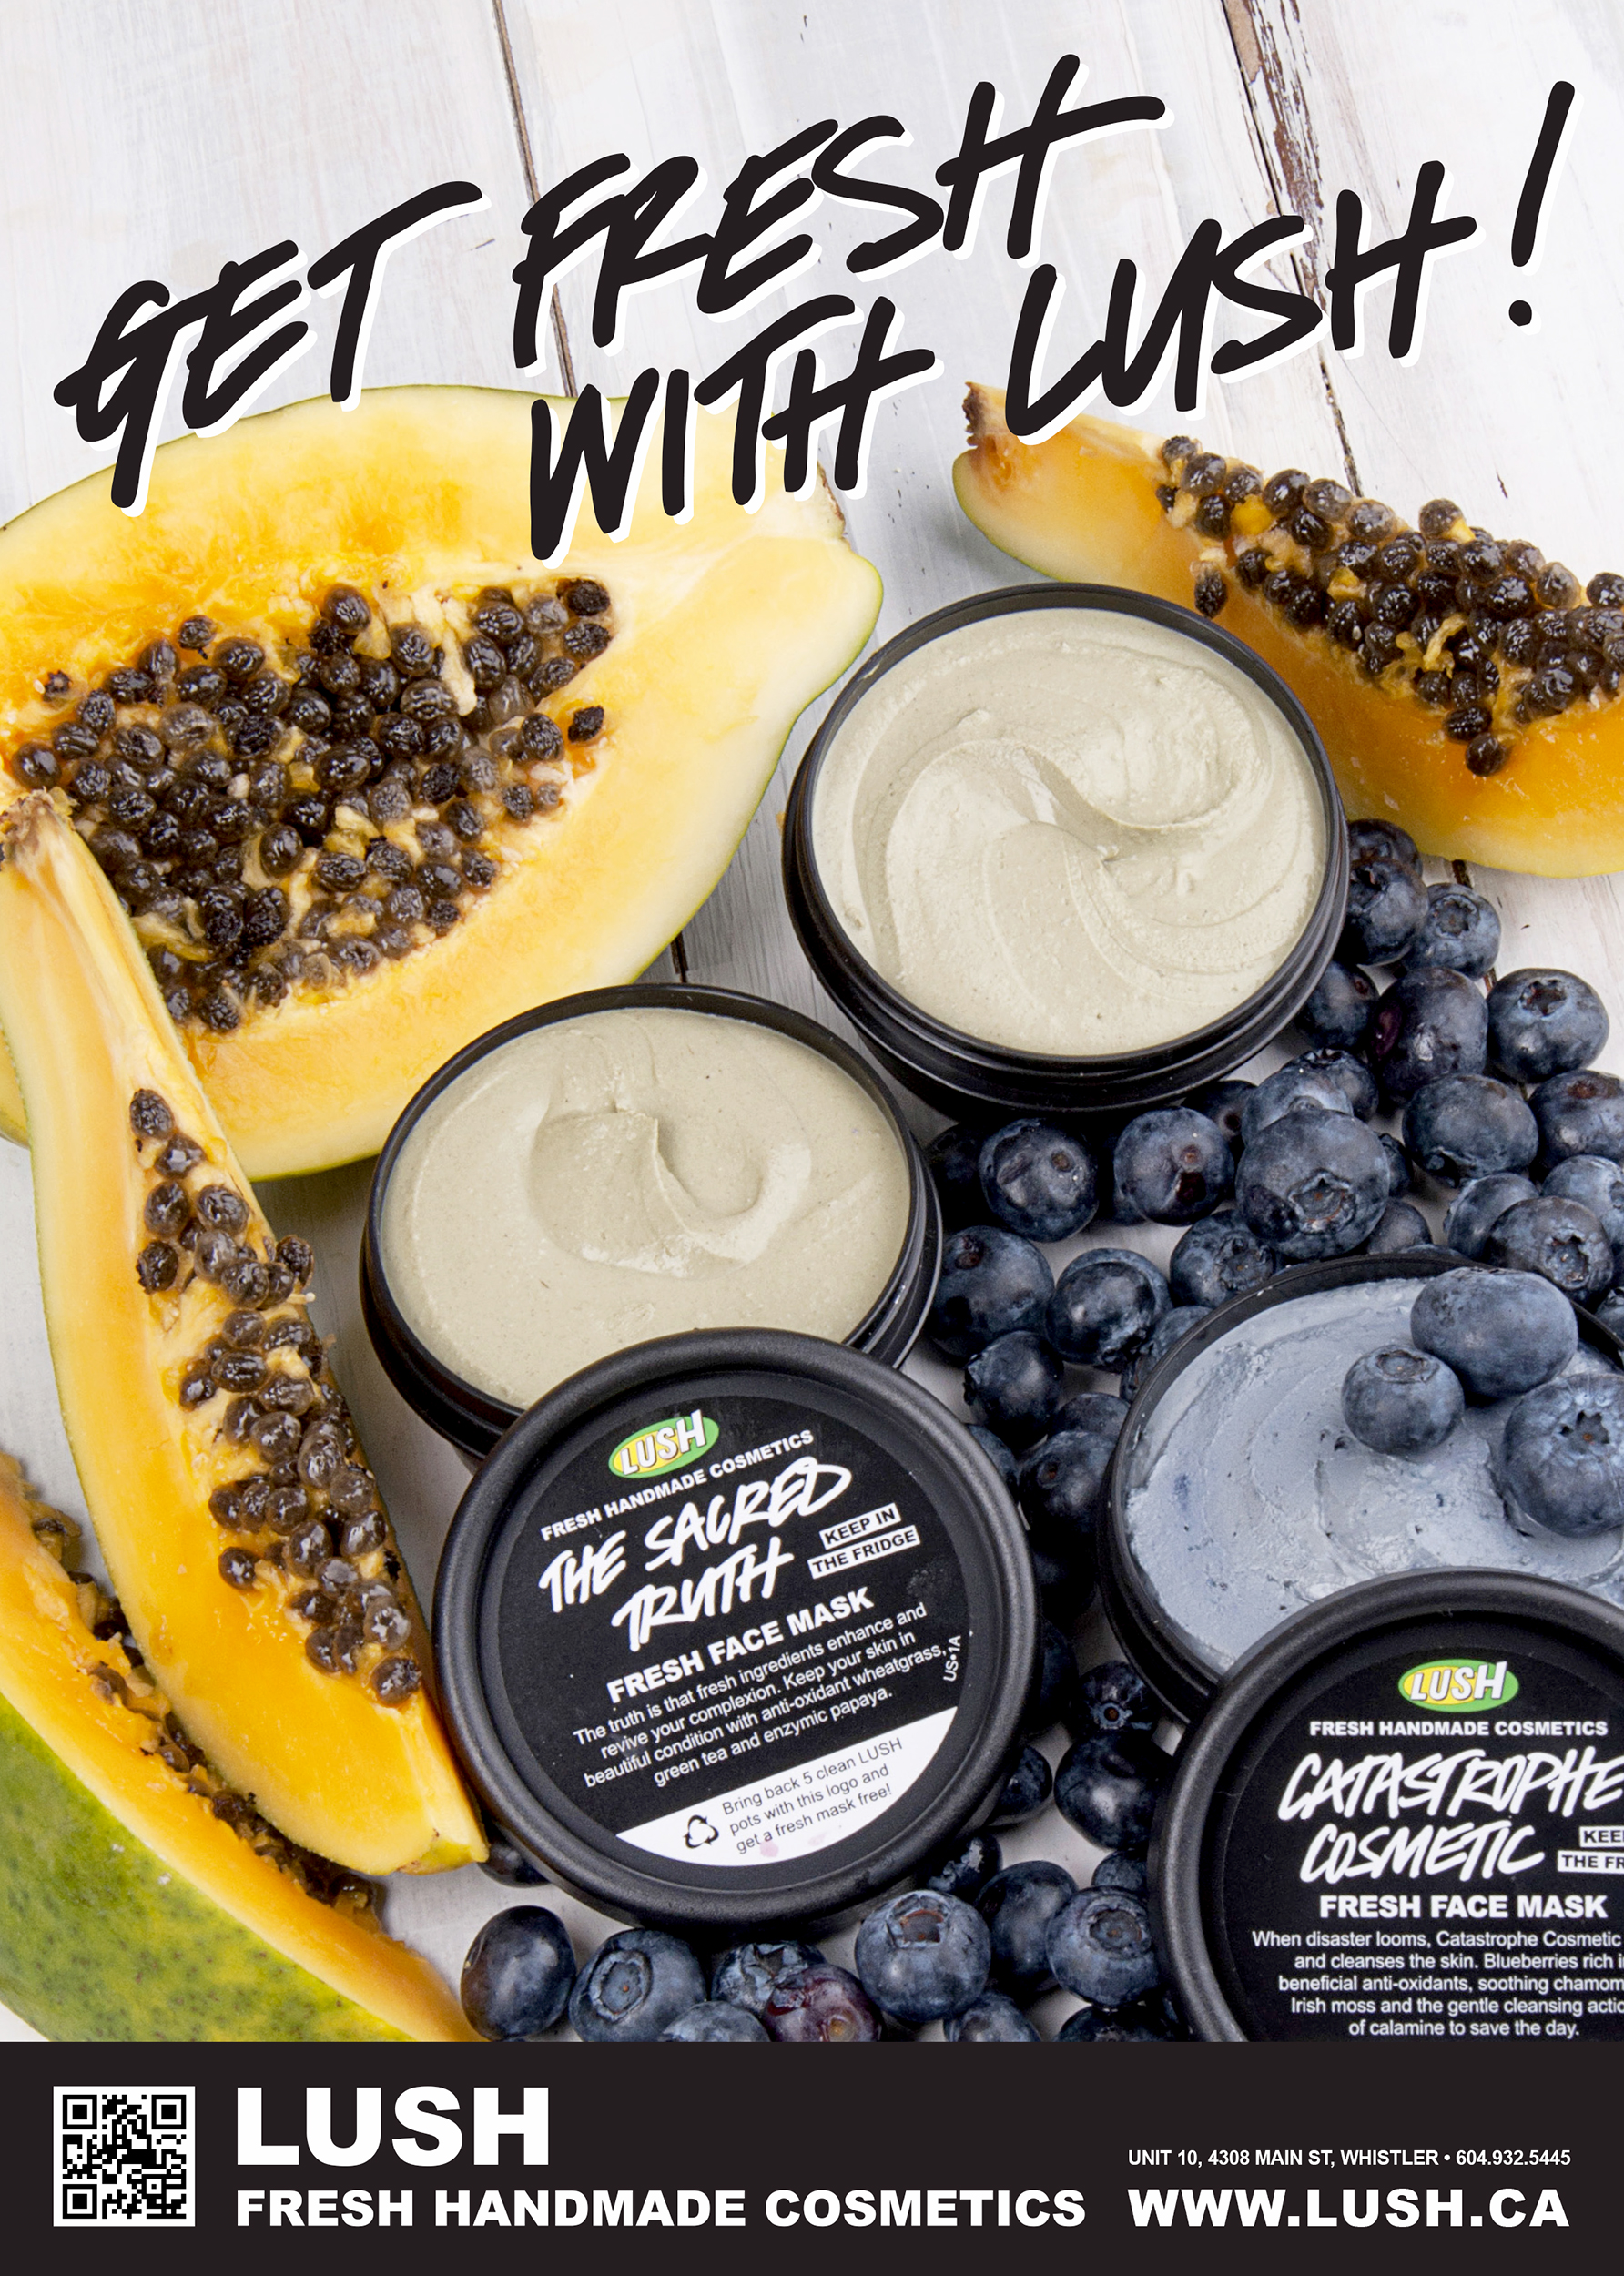 Print Ad for LUSH Cosmetics